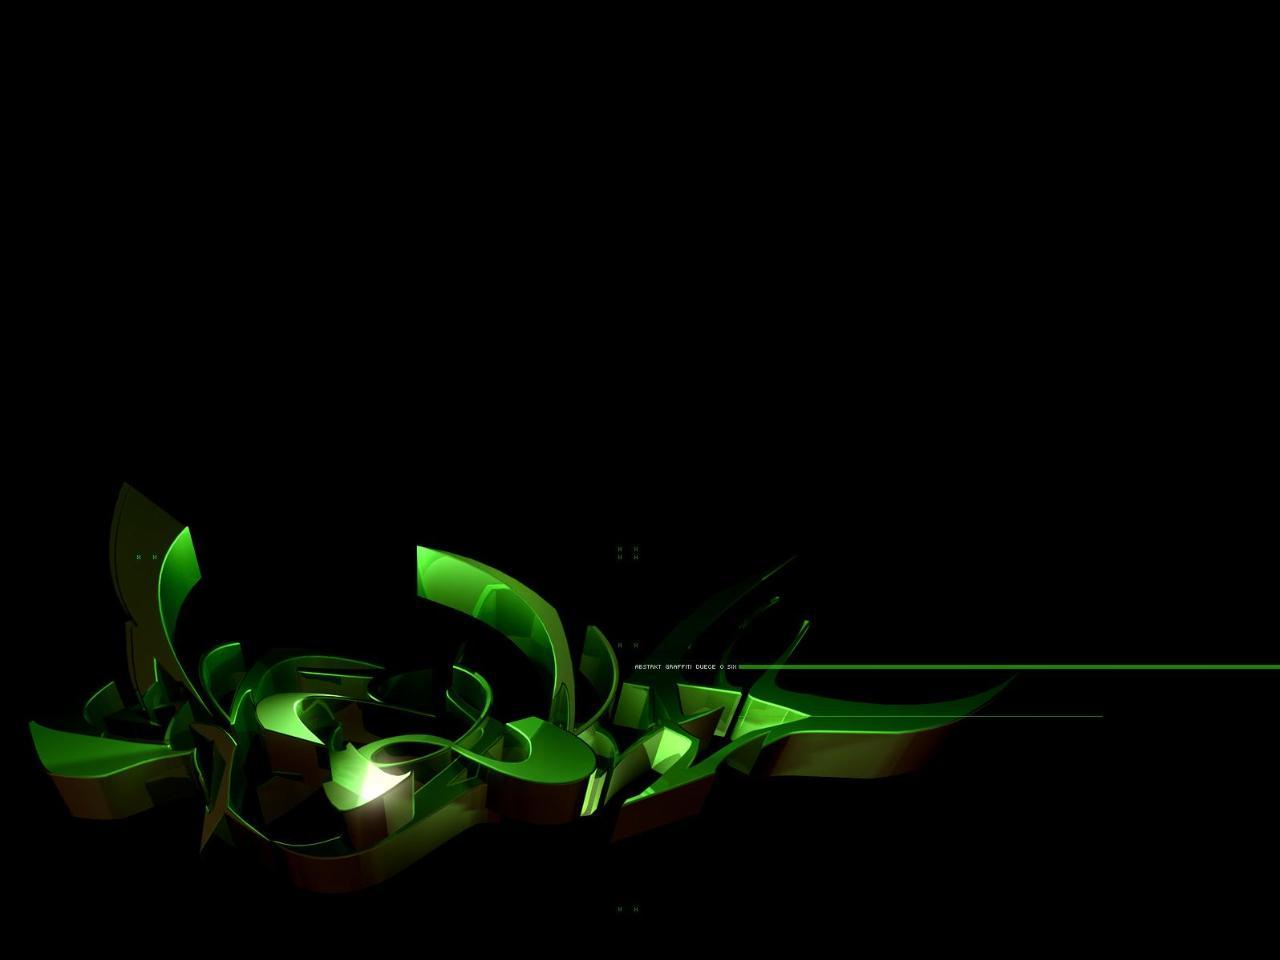 Graffiti Wallpapers Green In Black Of 3d Graffiti Art Wallpaper